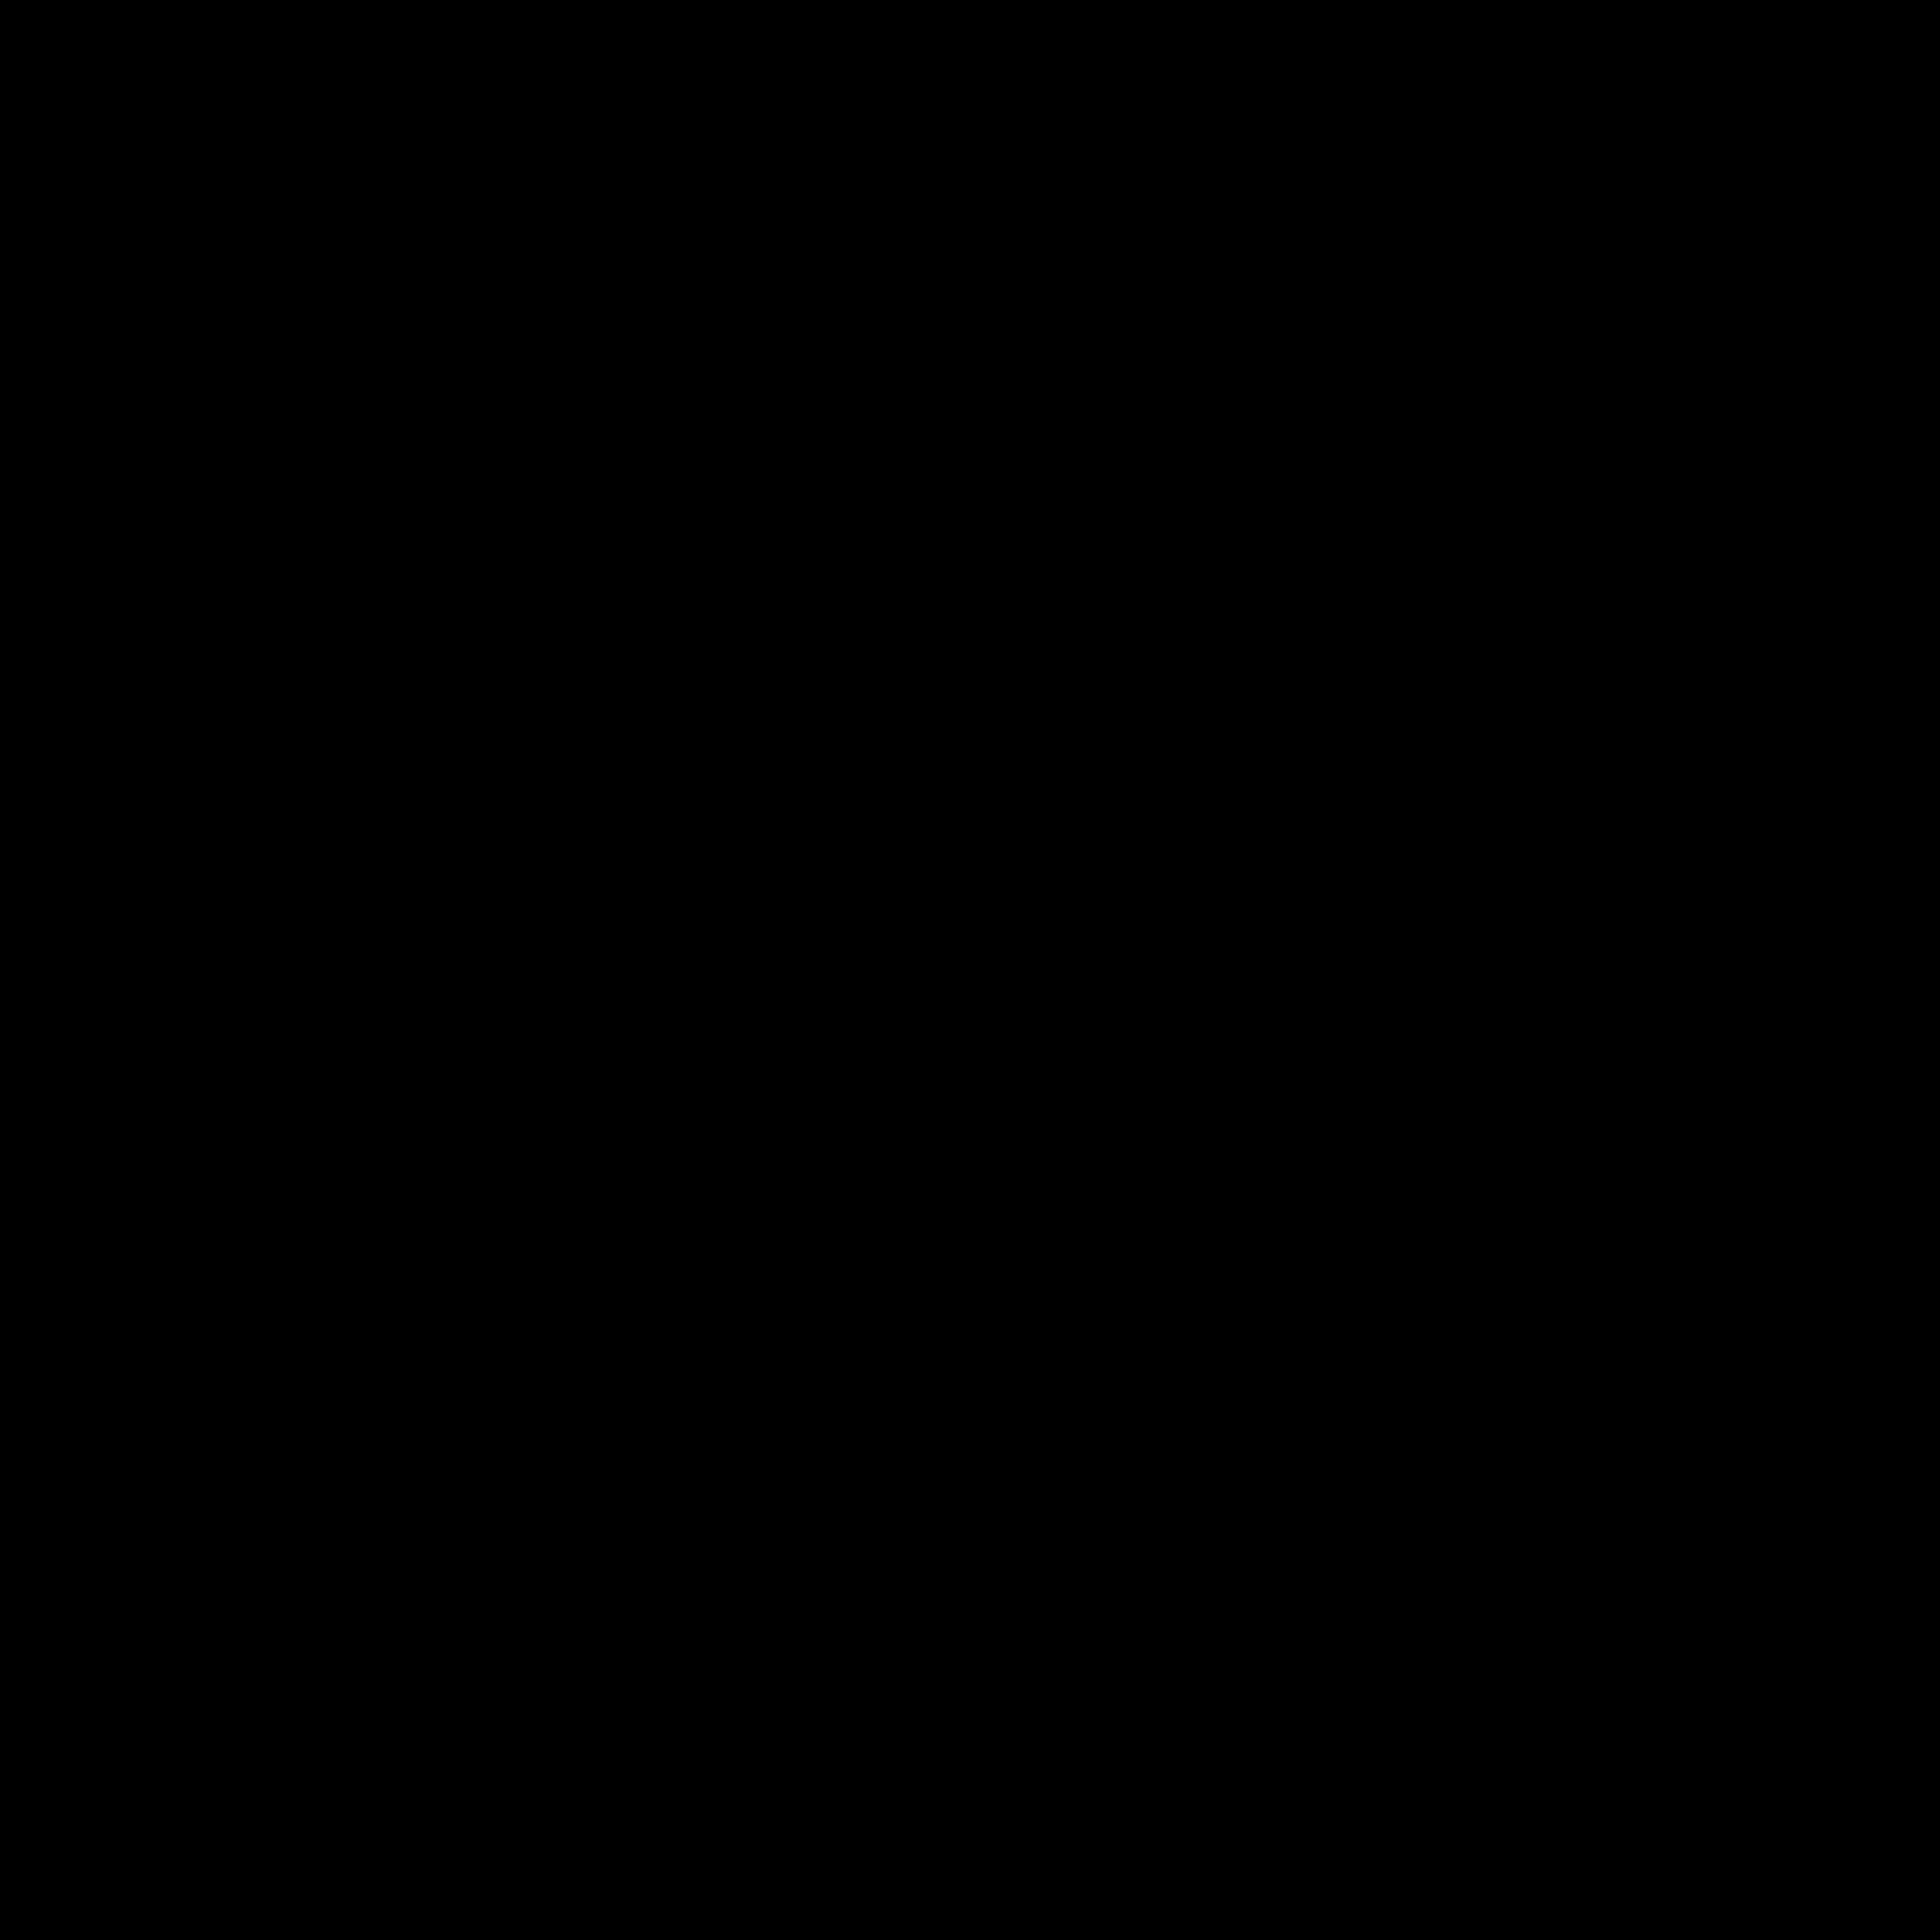 Ghost Band Symbols